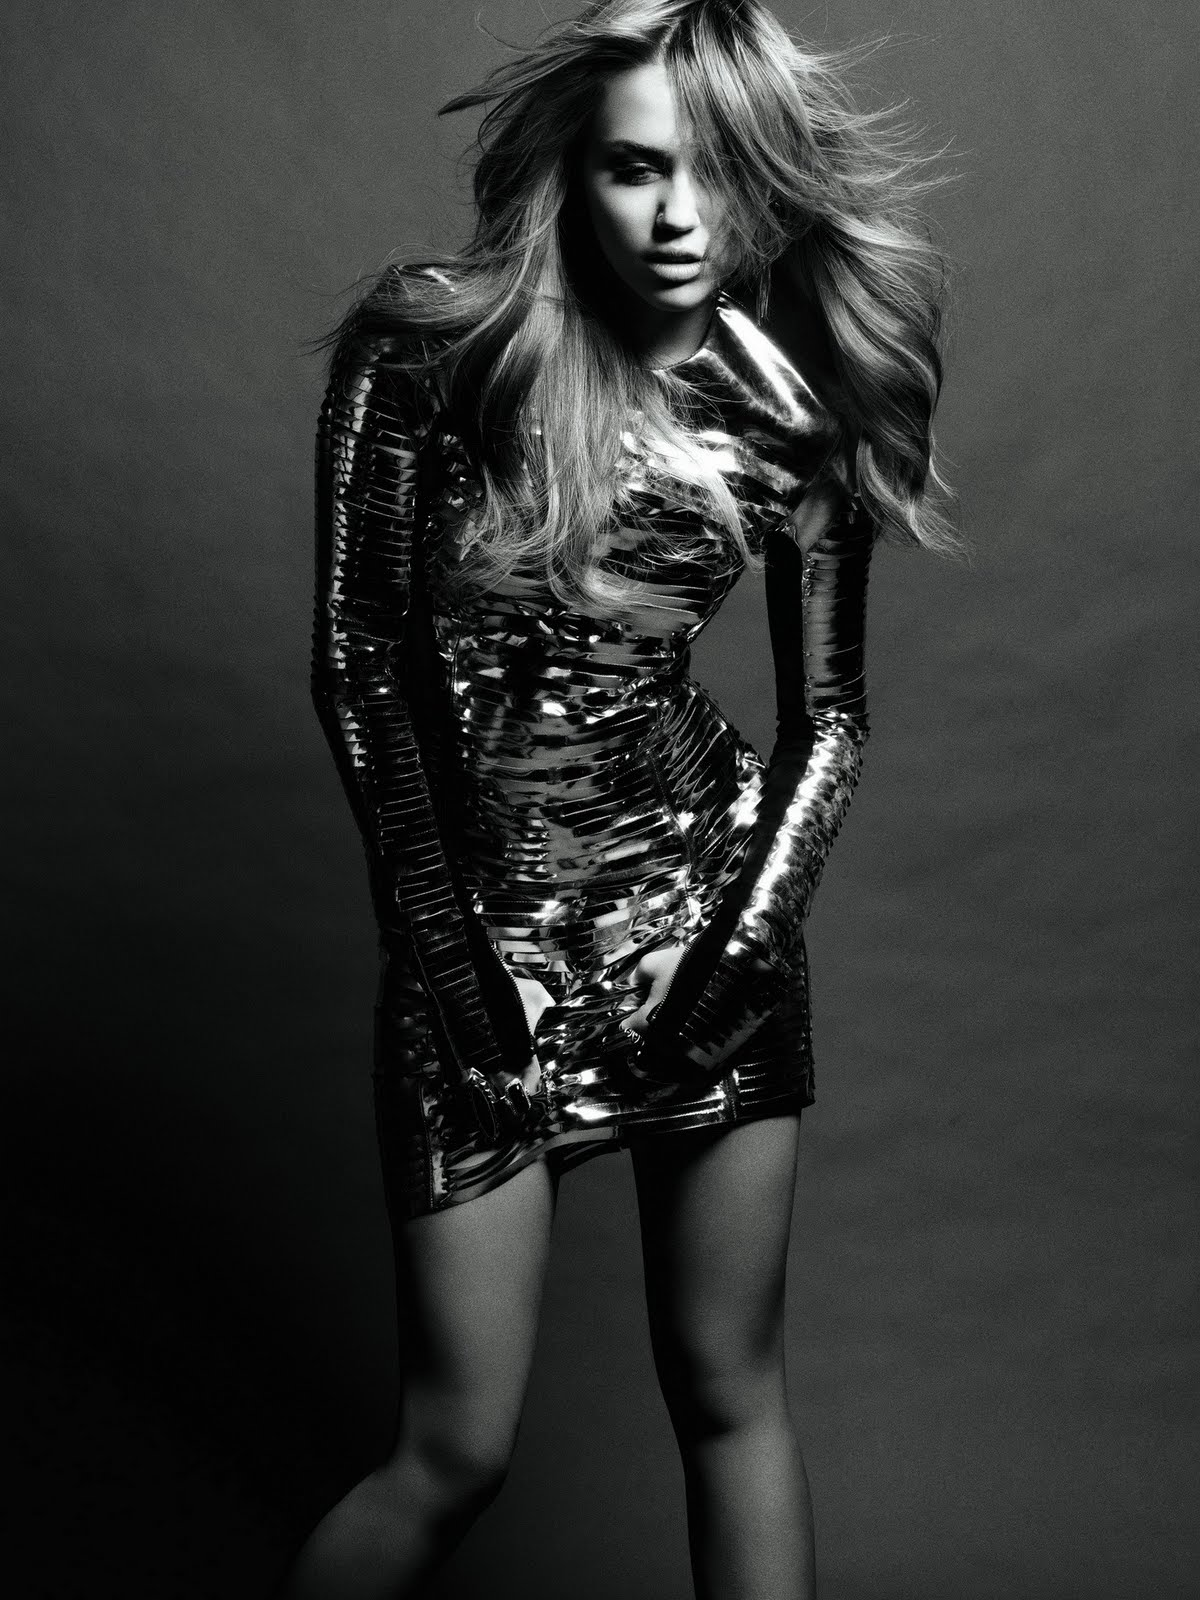 http://3.bp.blogspot.com/-rYmT4jemShg/TWi8FmoSgKI/AAAAAAAAIA8/SpWcPiIhYhk/s1600/Miley-Cyrus-56.jpg